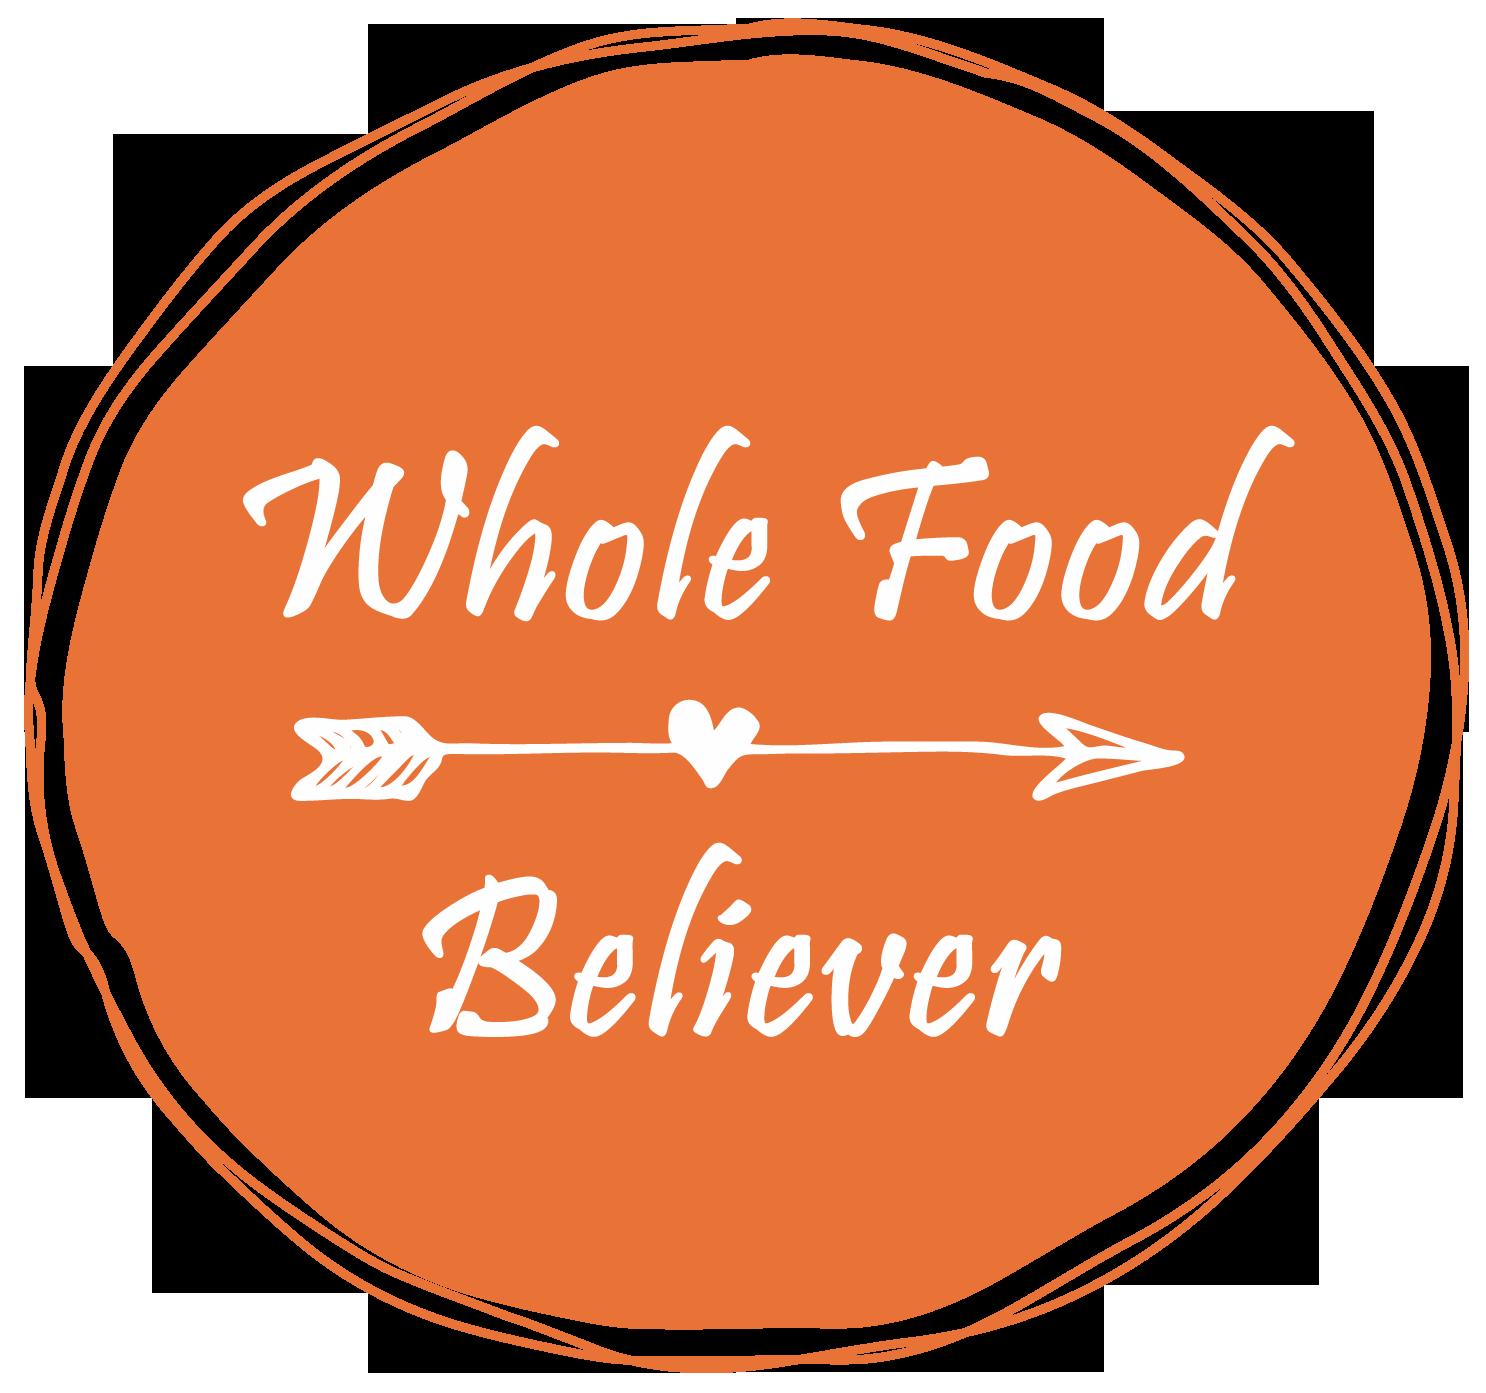 Whole Food Believer= www.wholefoodbeliever.com